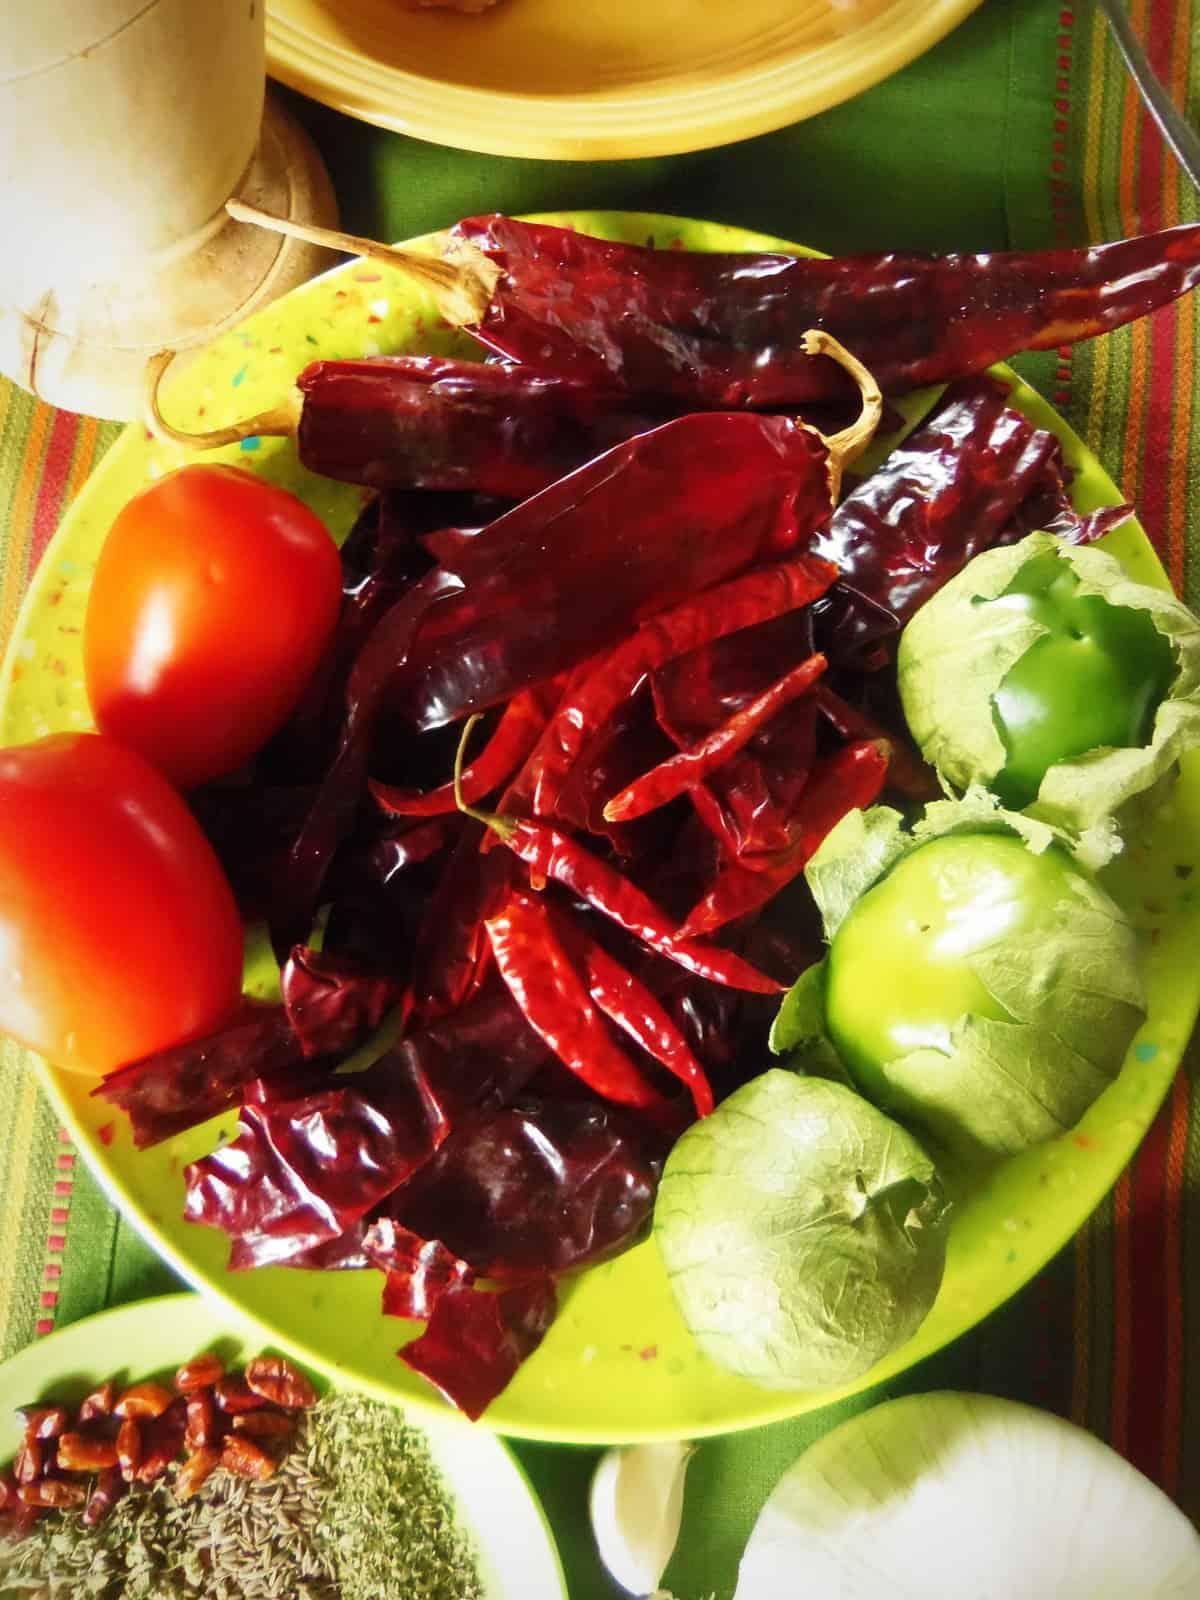 Guajillo, Chile de Arbol, Tomatillos and tomatoes....to make a salsa or sauce